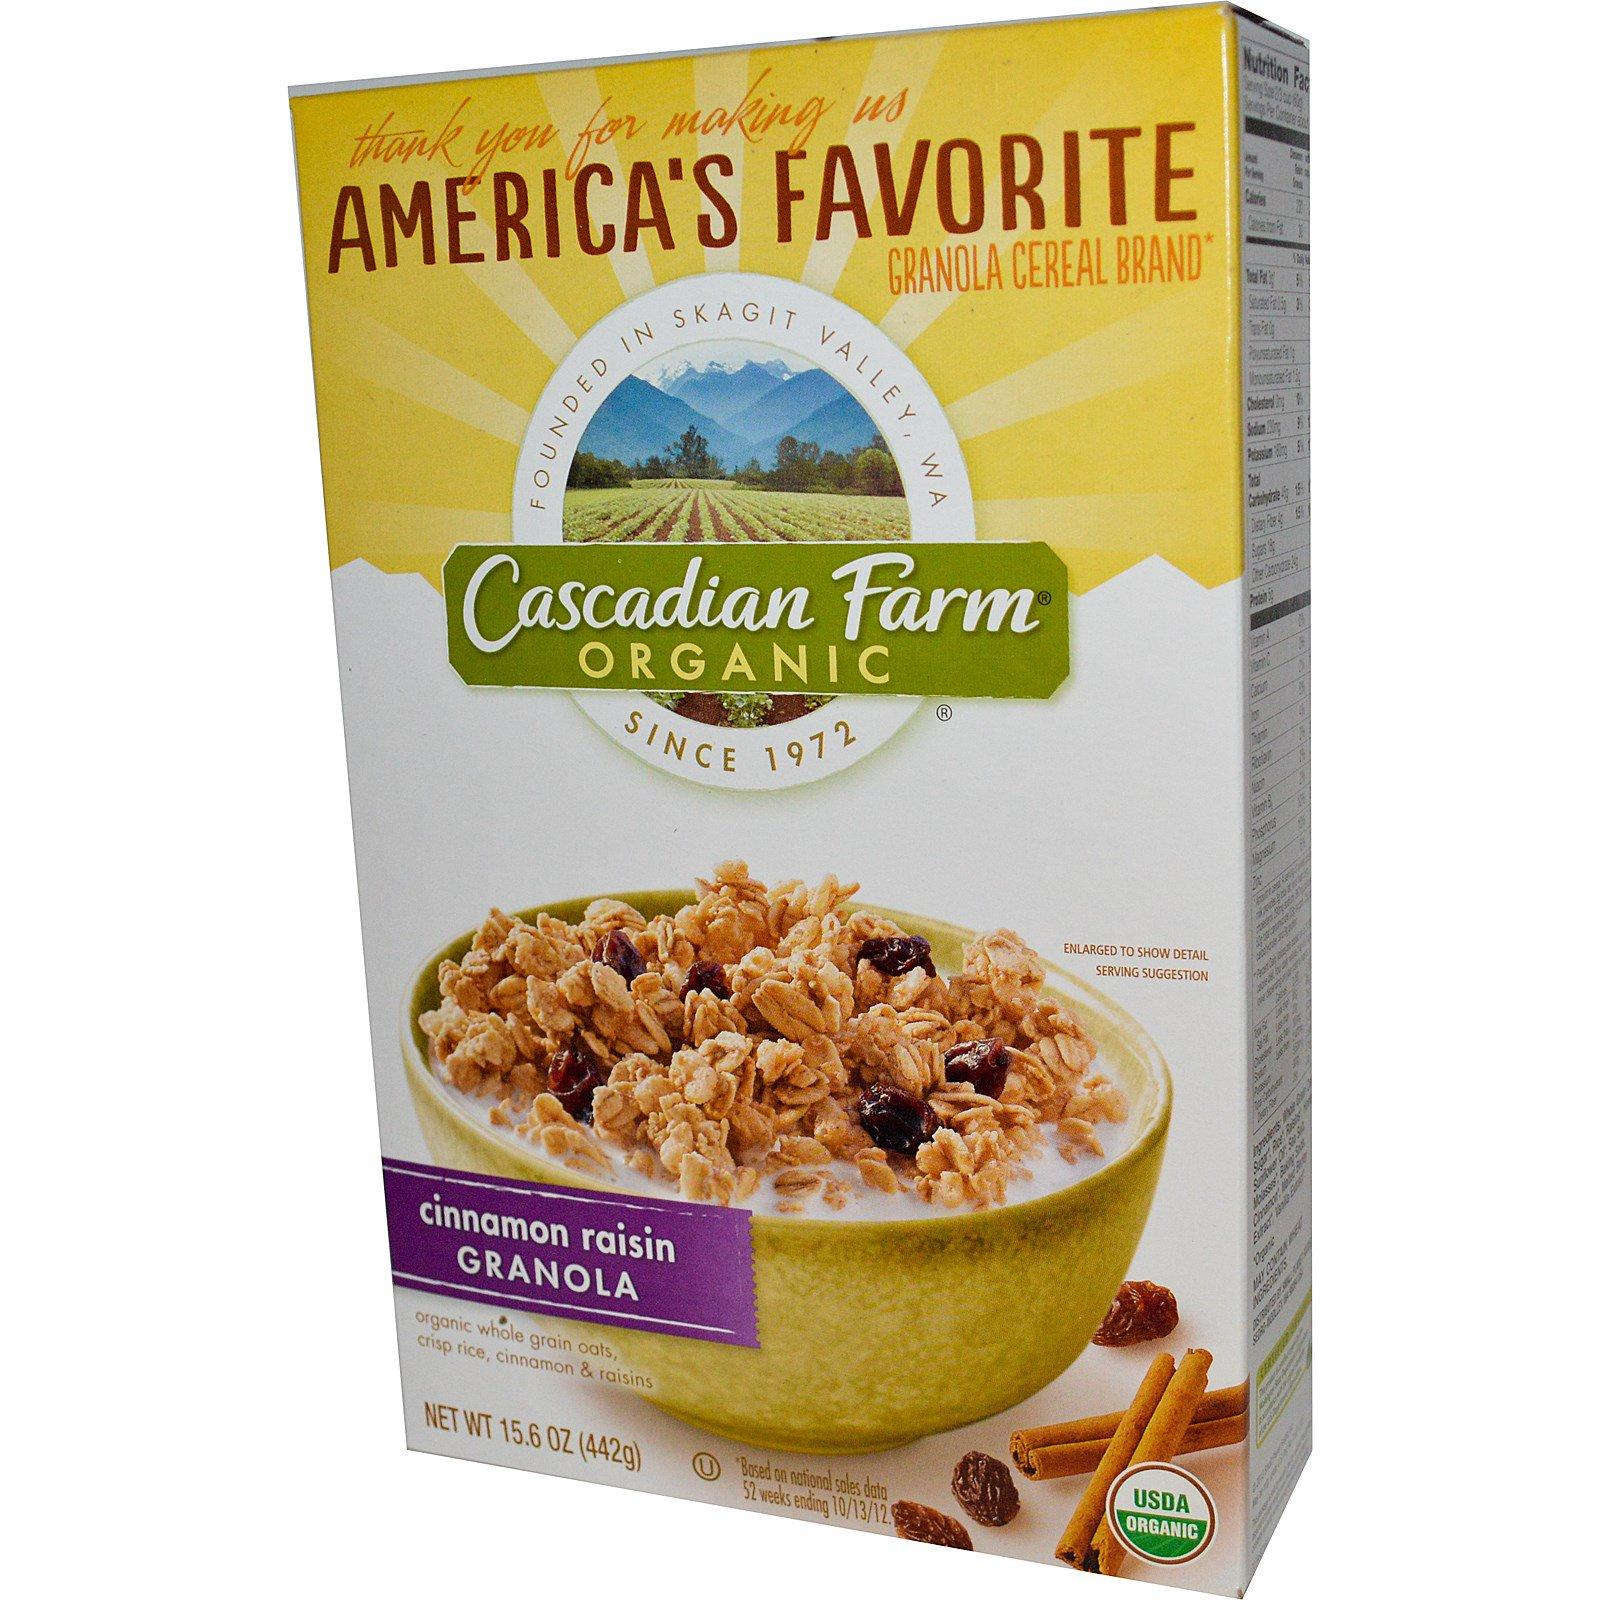 Cascadian Farm, Organic, гранола с корицей и изюмом 15.6 унции (442 г)